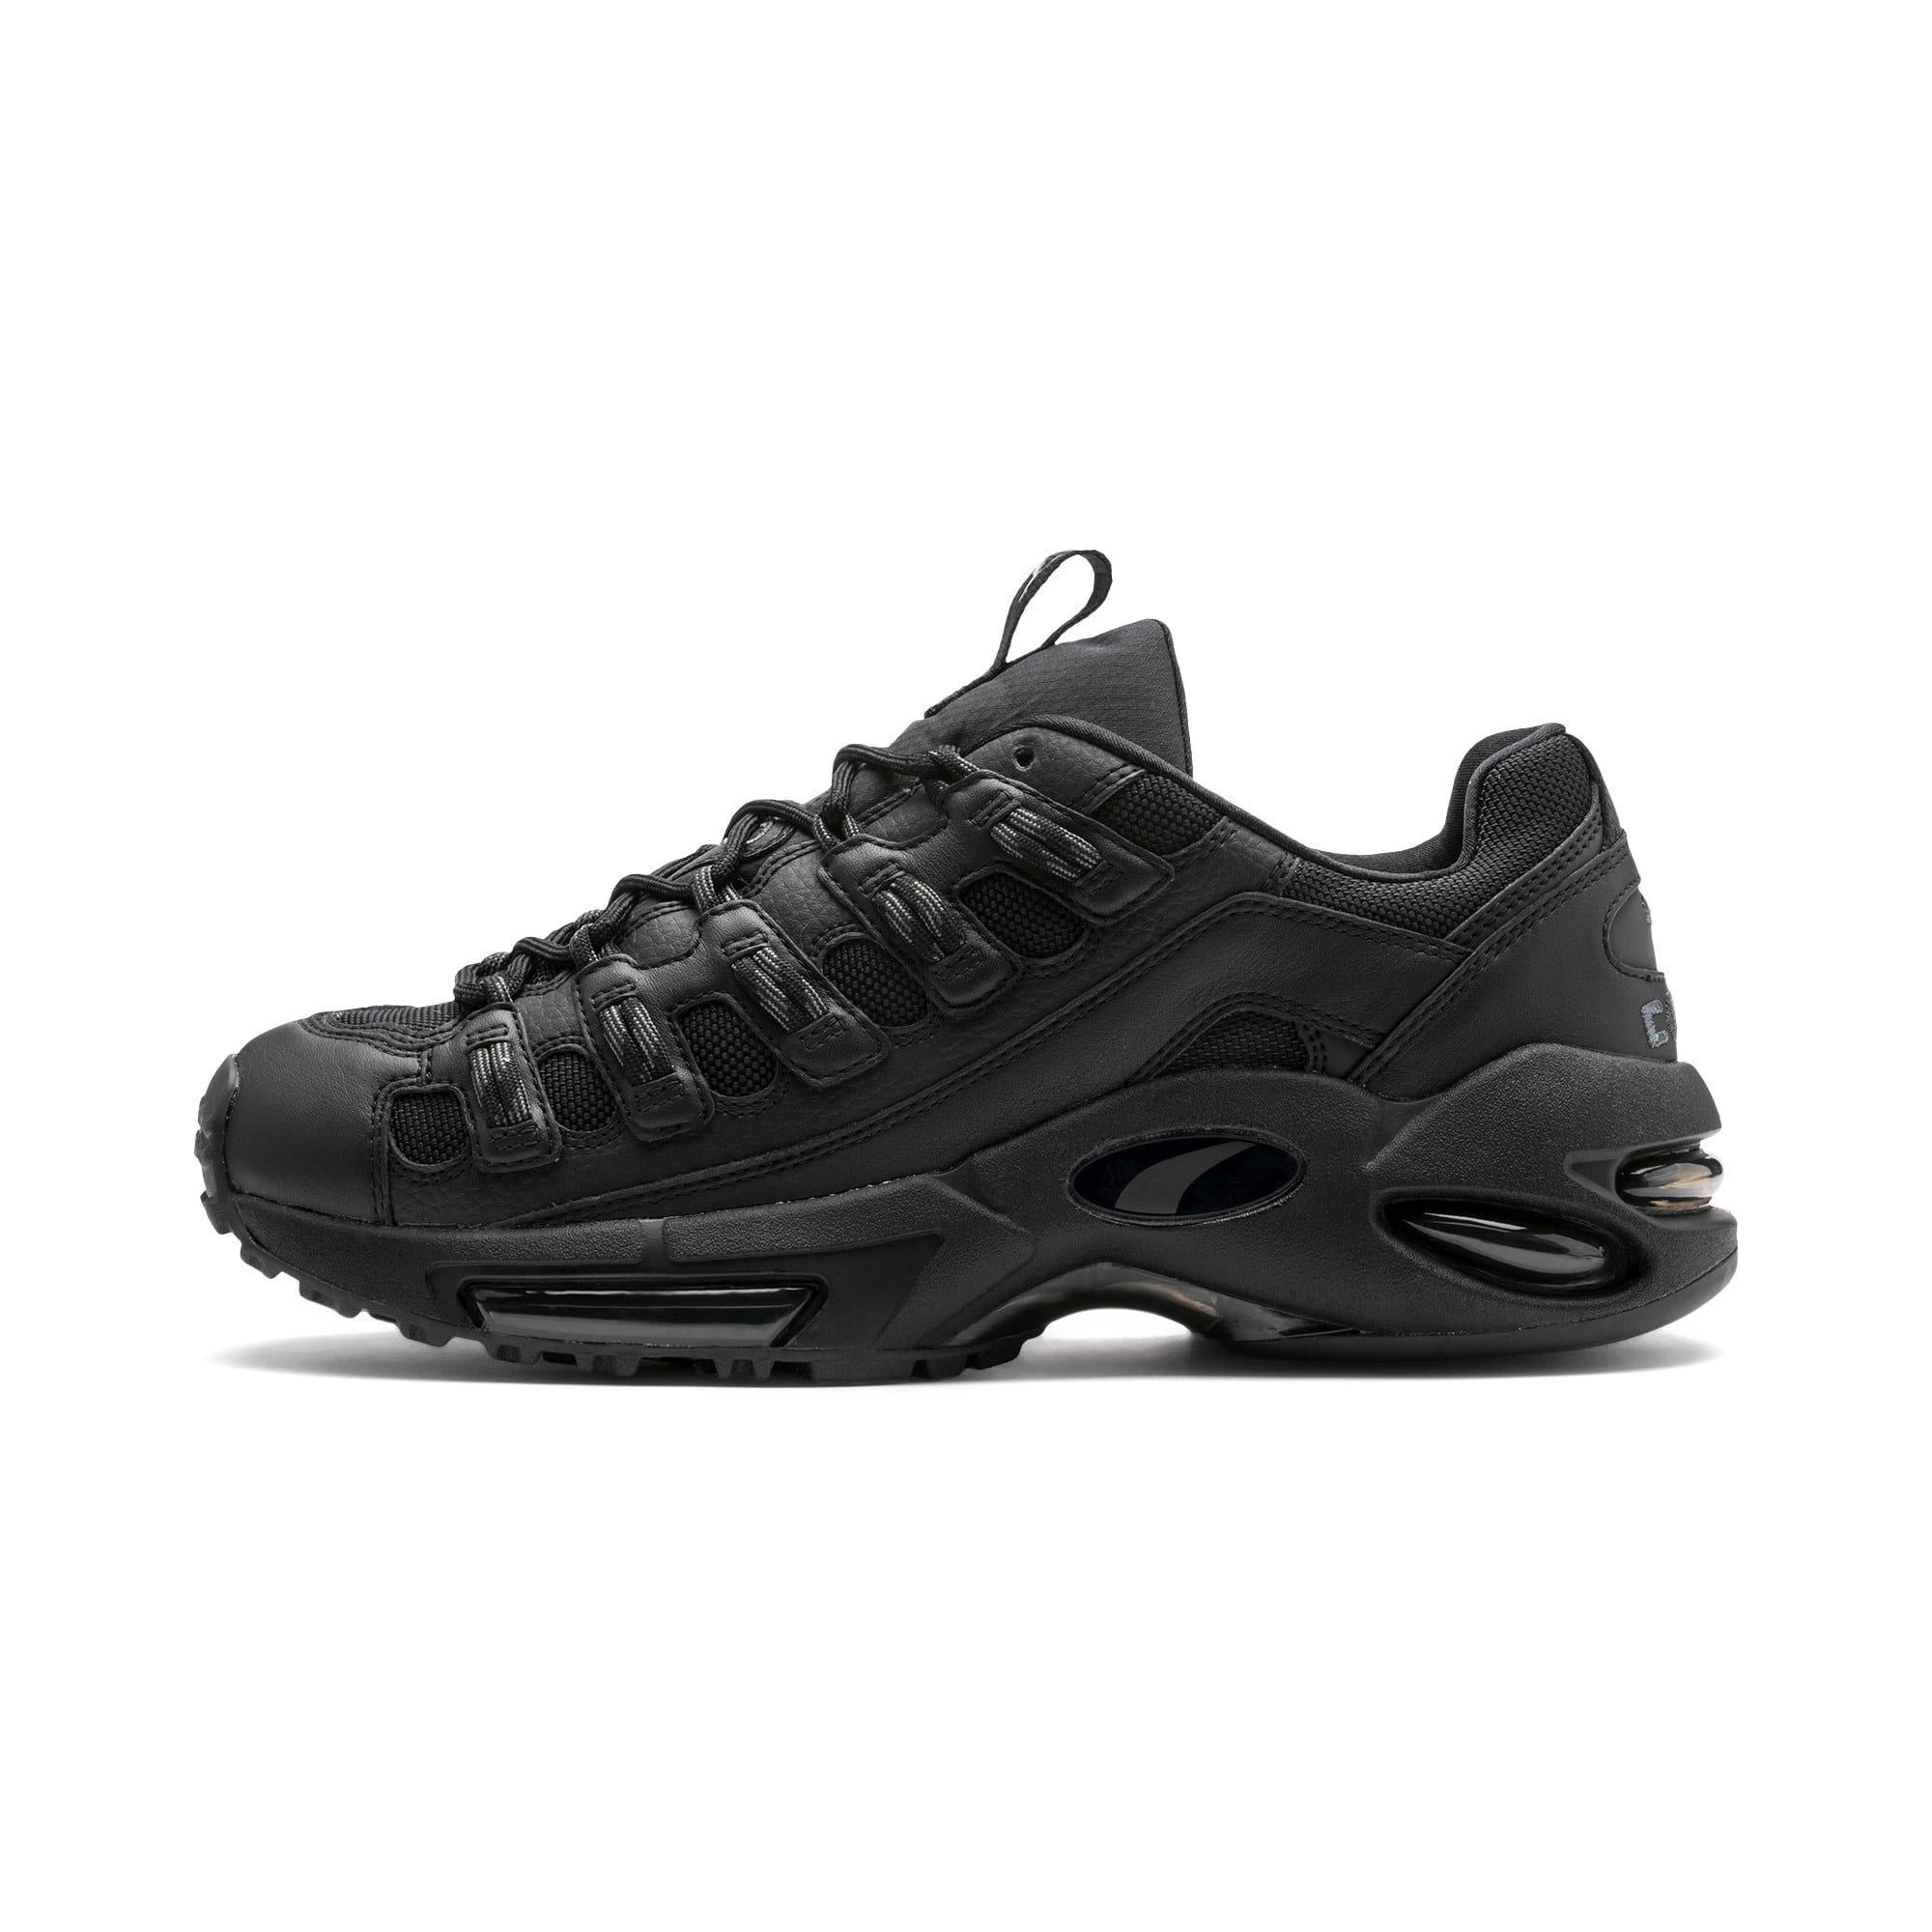 Thumbnail 1 of CELL Endura Rebound Sneakers, Puma Black-Puma Black, medium